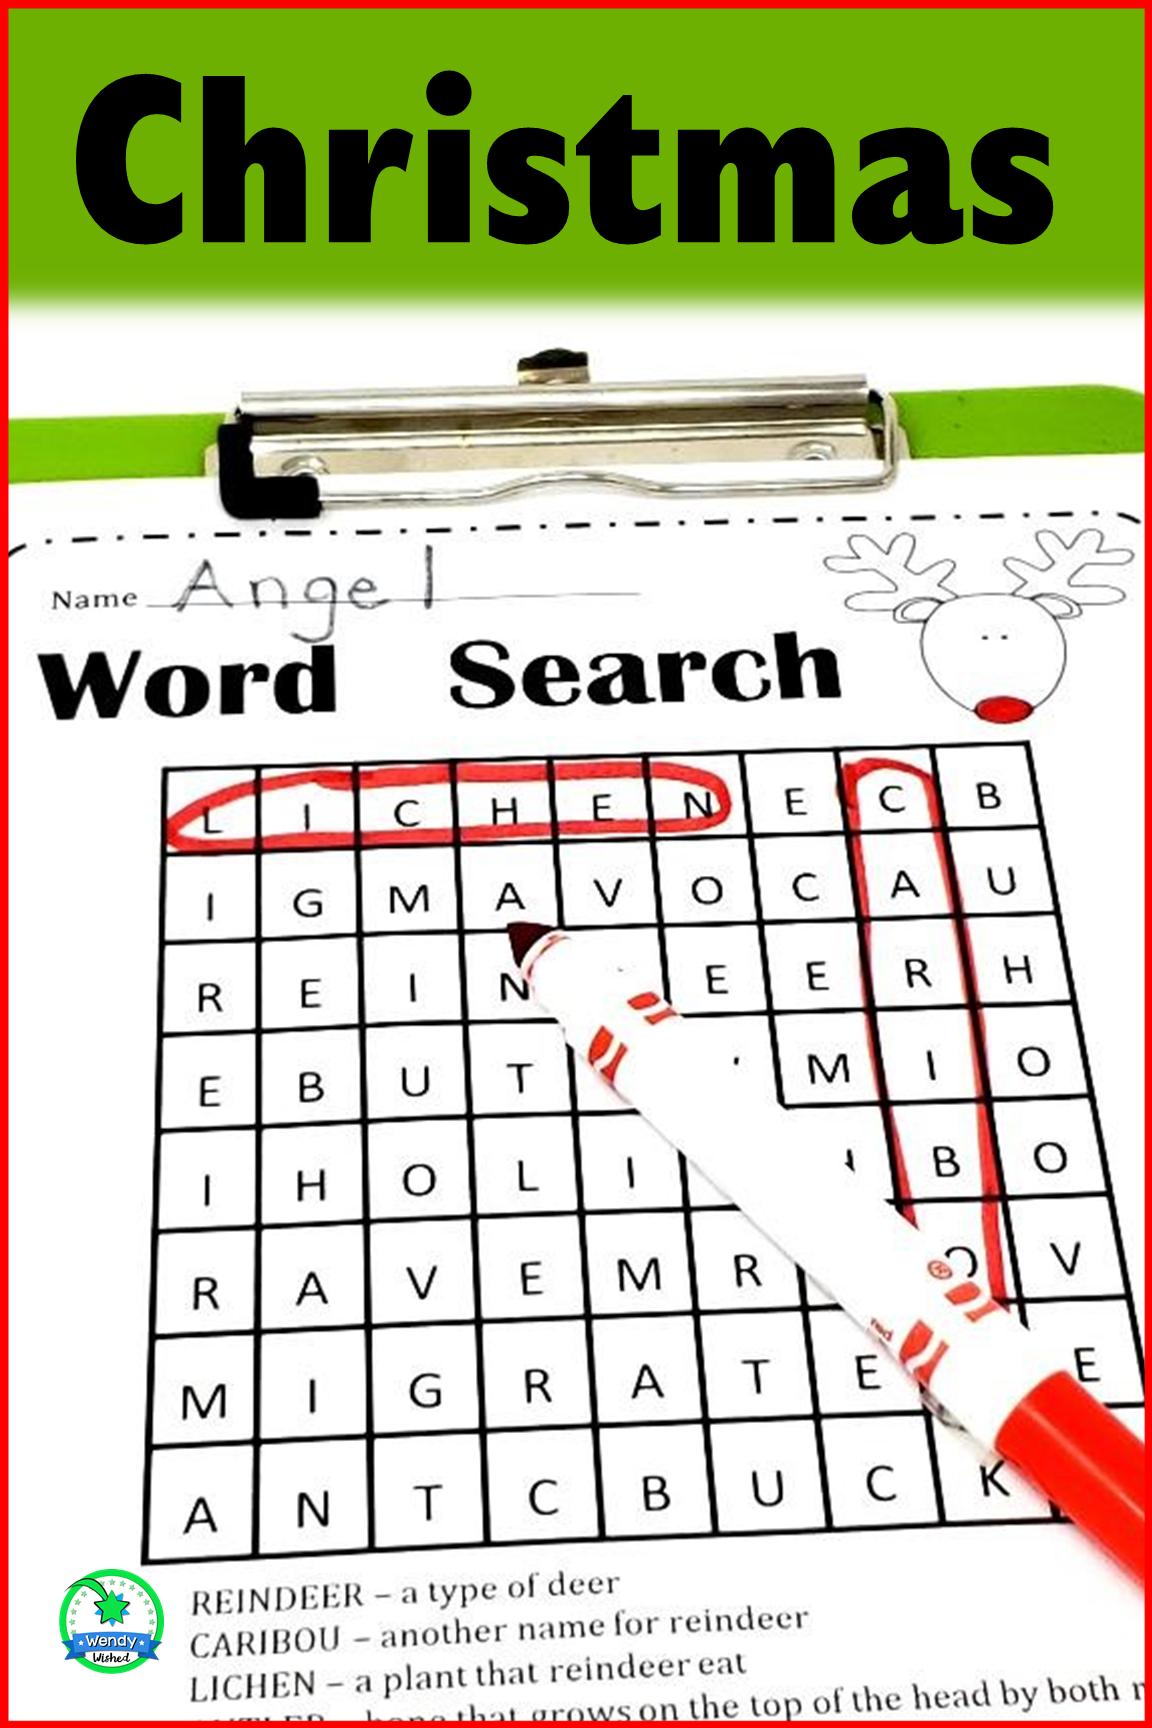 Predownload: Christmas Worksheets For 2nd Grade Grammar Grammar Worksheets Good Grammar Christmas Worksheets [ 1728 x 1152 Pixel ]